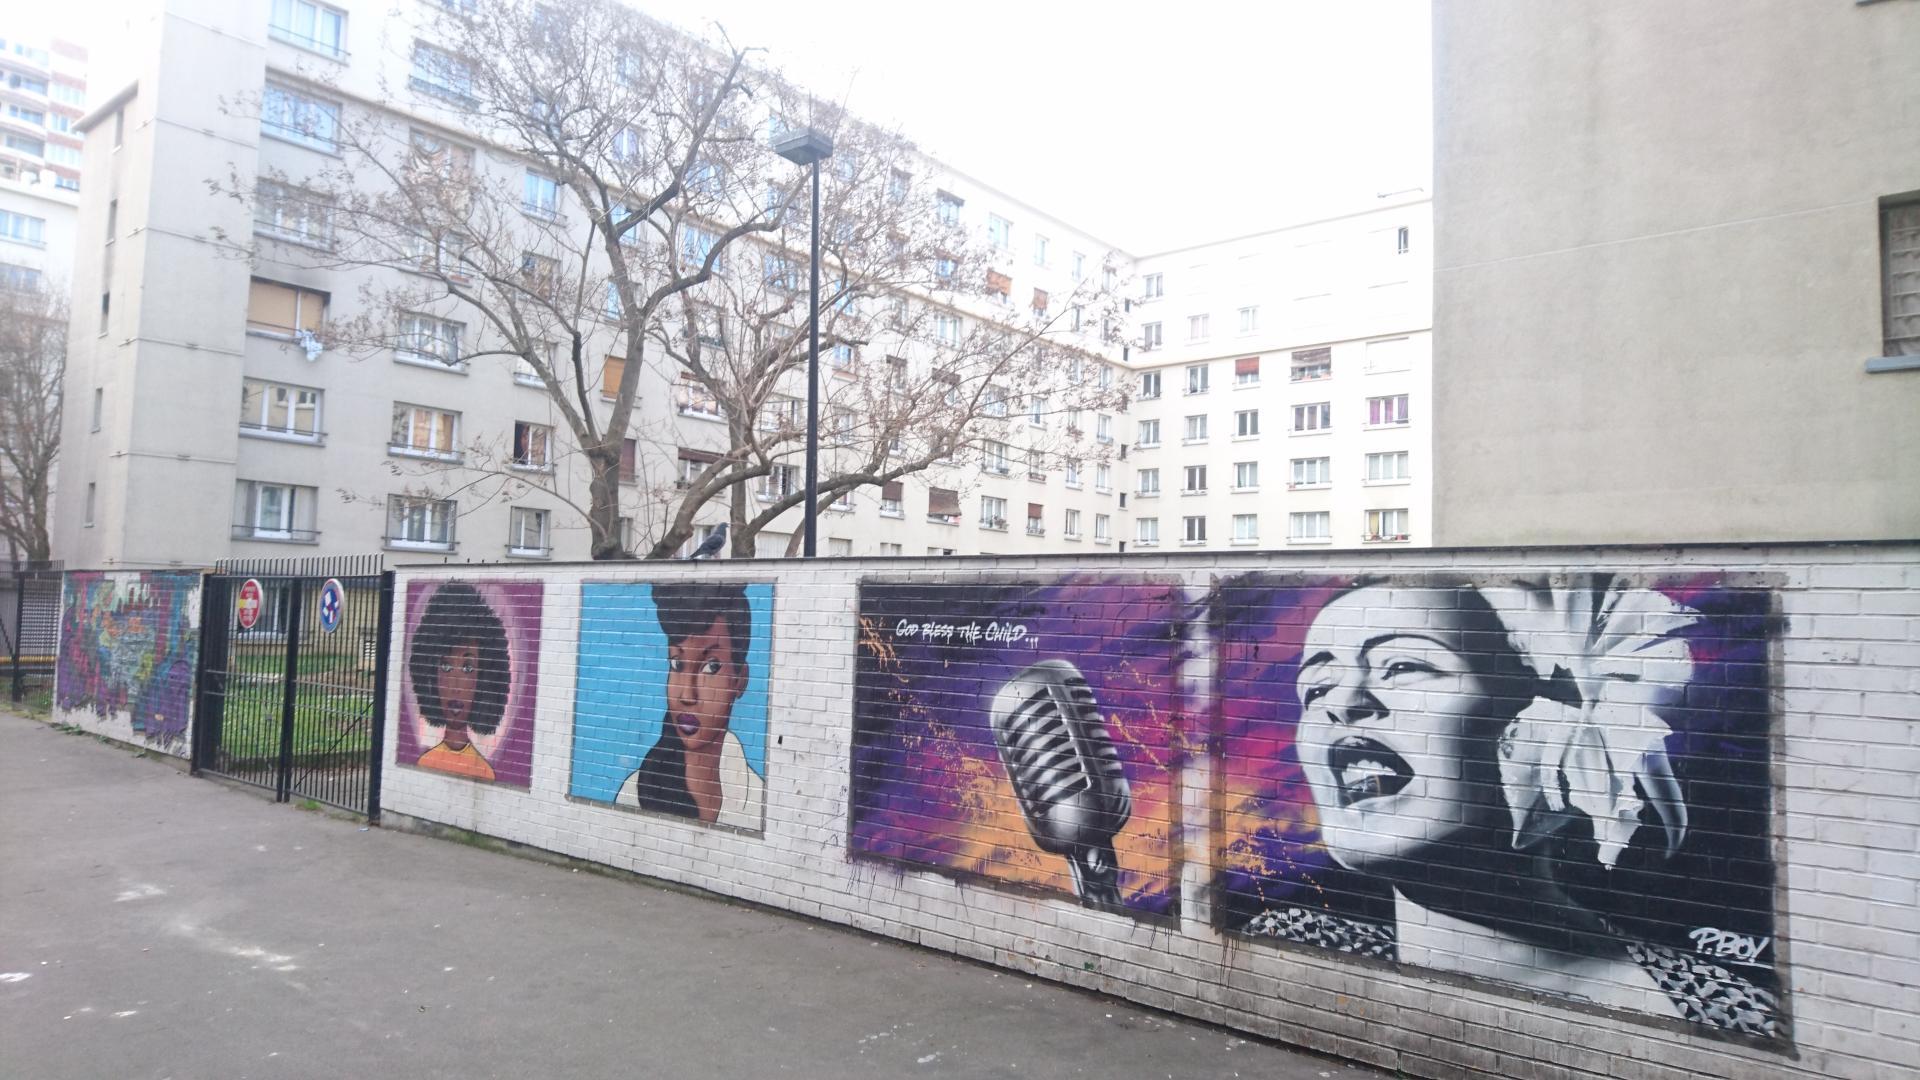 jeu-piste-paris-sortie-printemps-graffiti